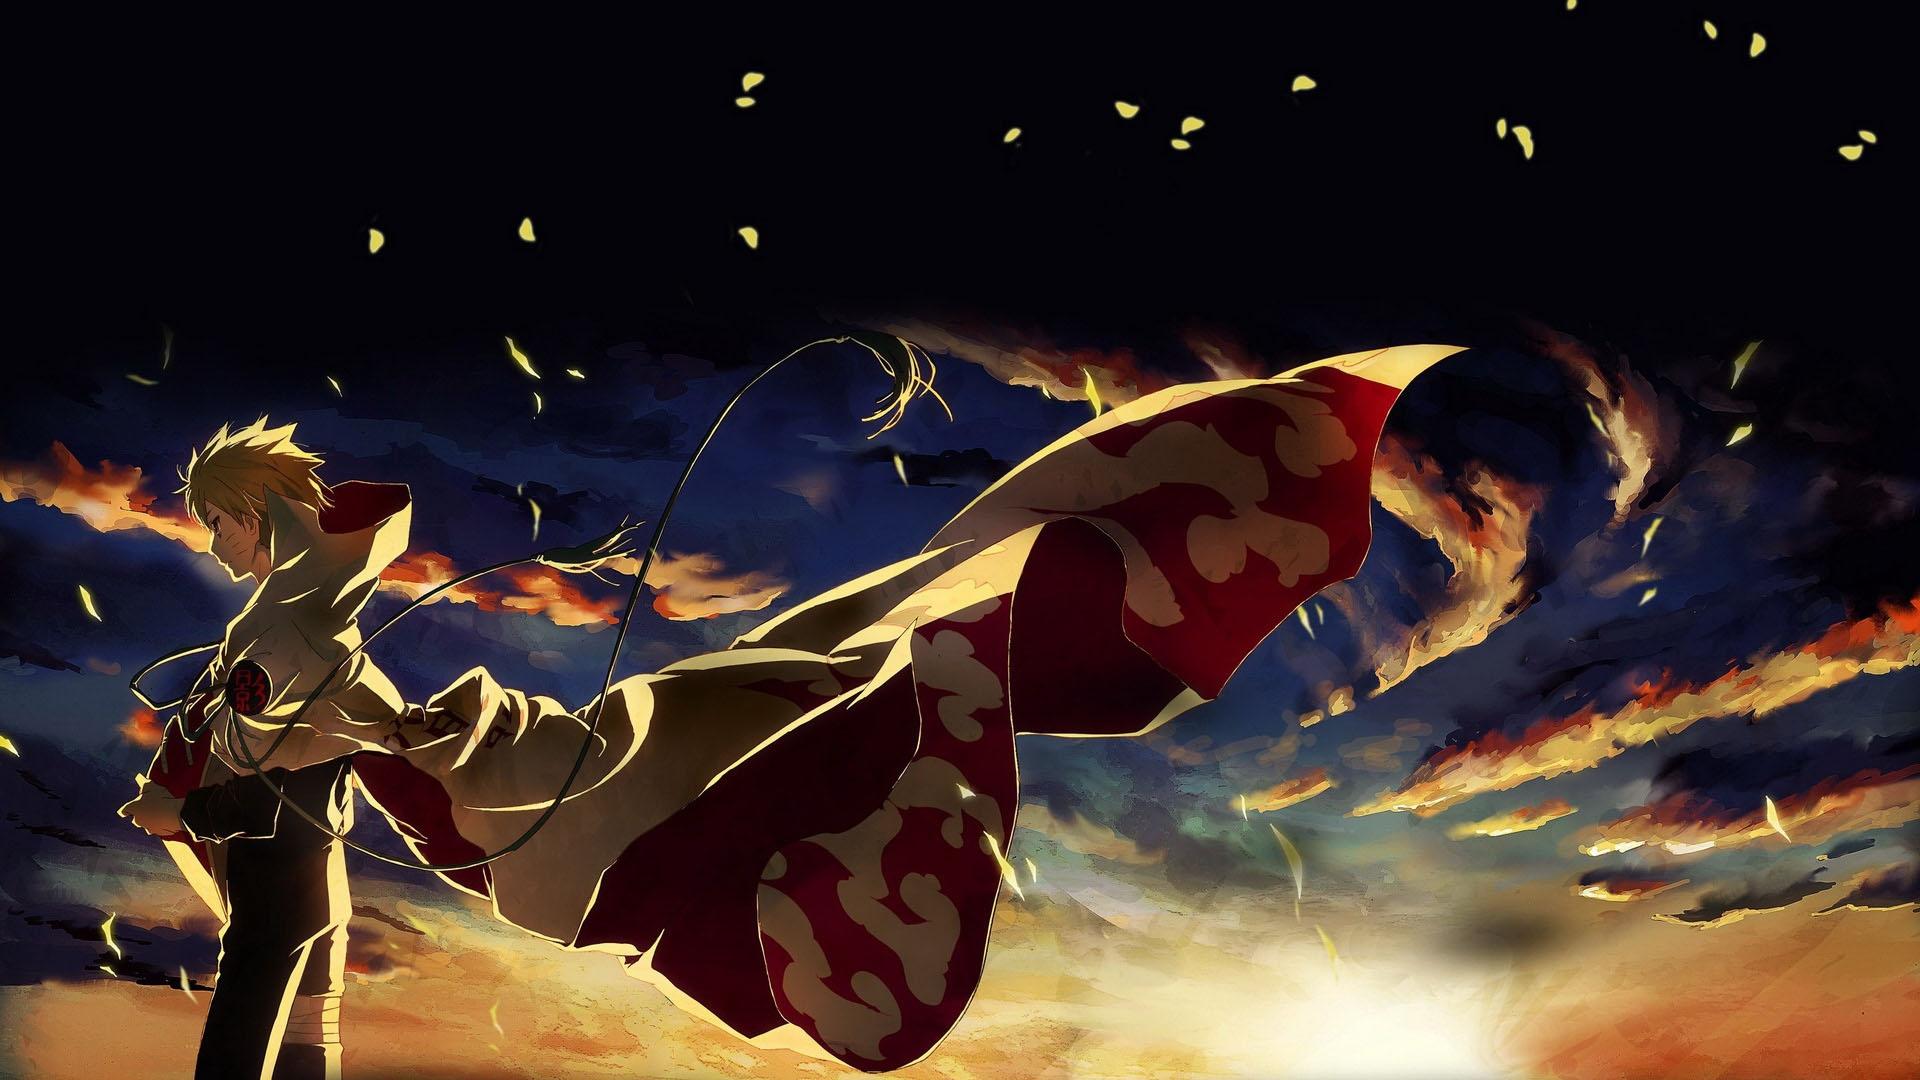 Anime Wallpaper Hd 1920x1080  Celebrated Wallpaper